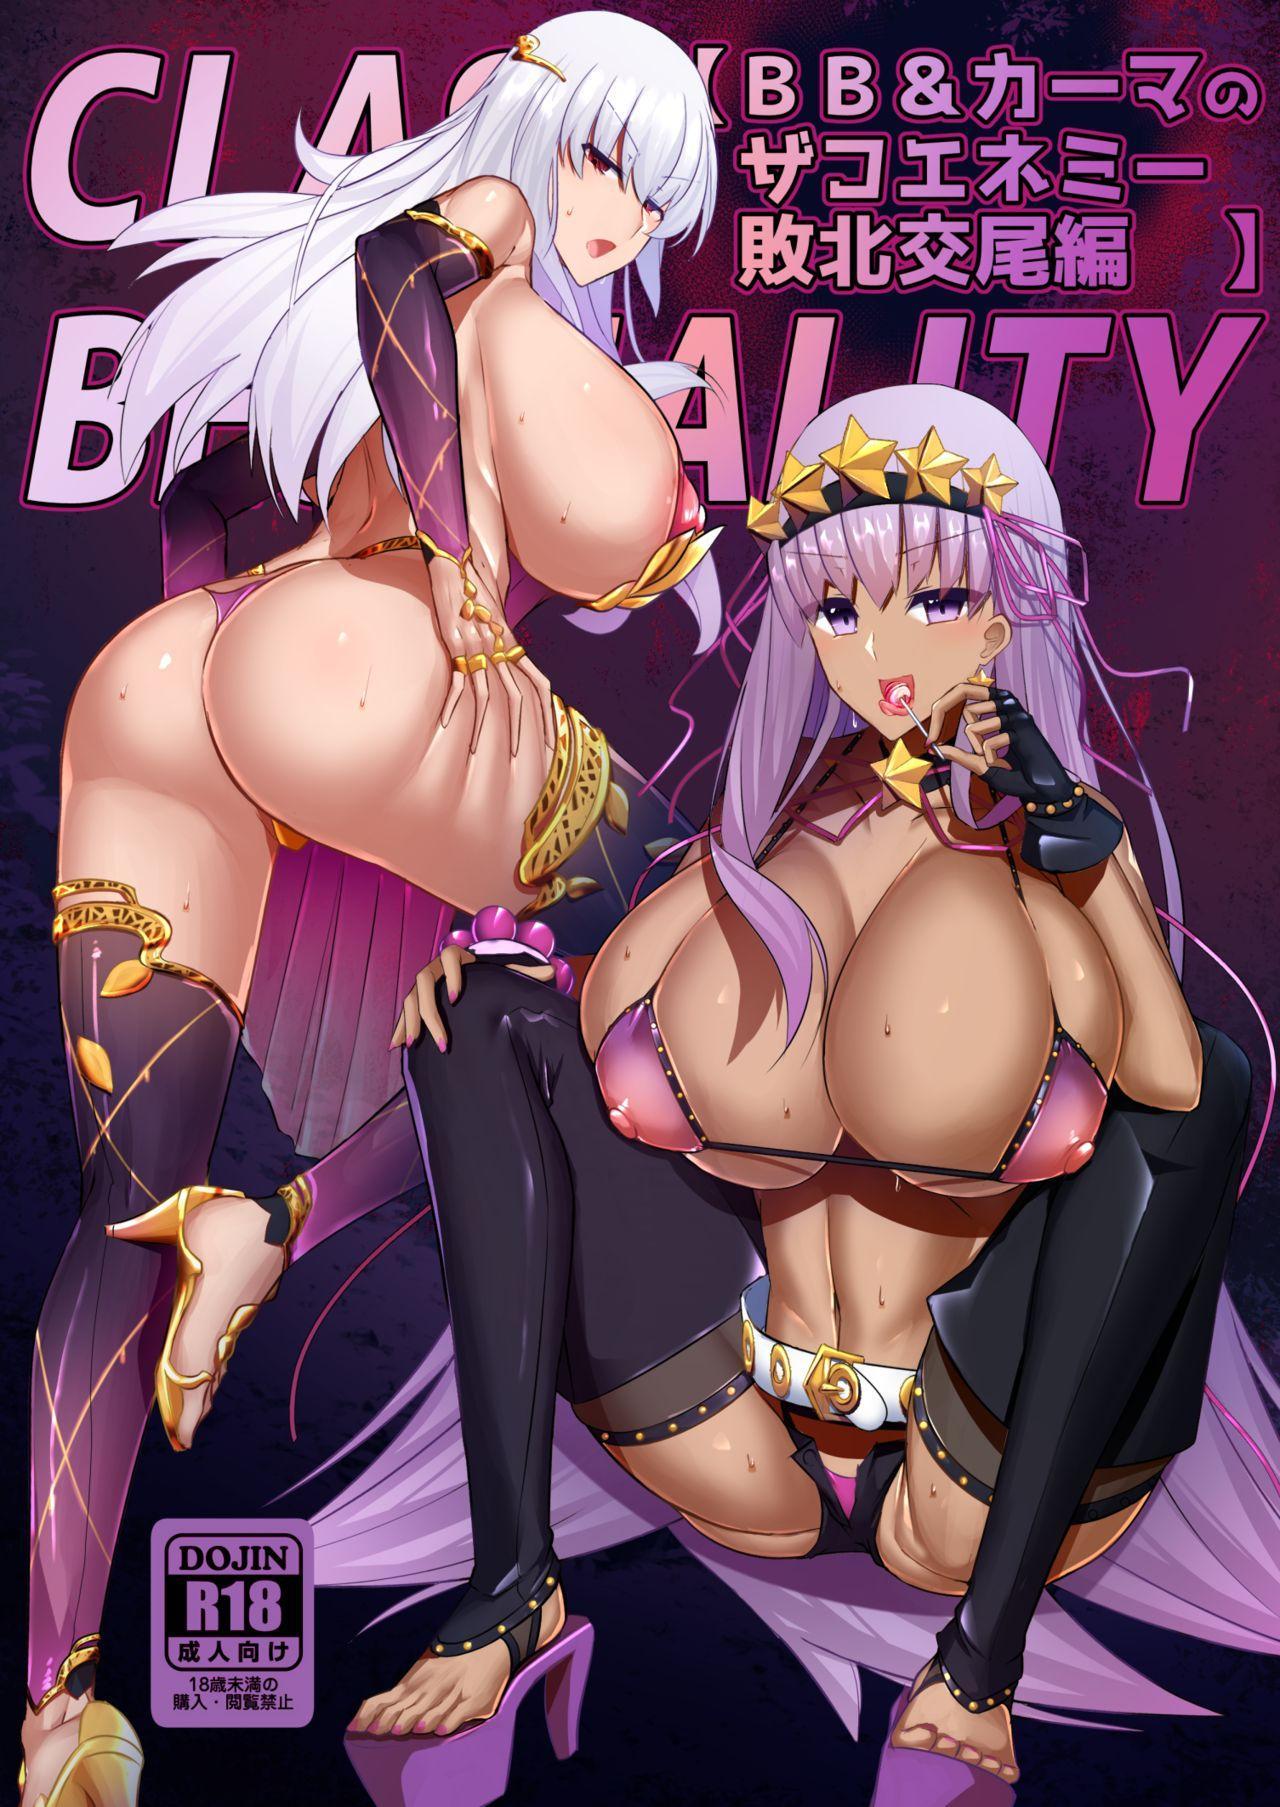 "CLASS BESTIALITY ""BB & Kama no Zako Enemy Haiboku Koubi Hen"" 0"